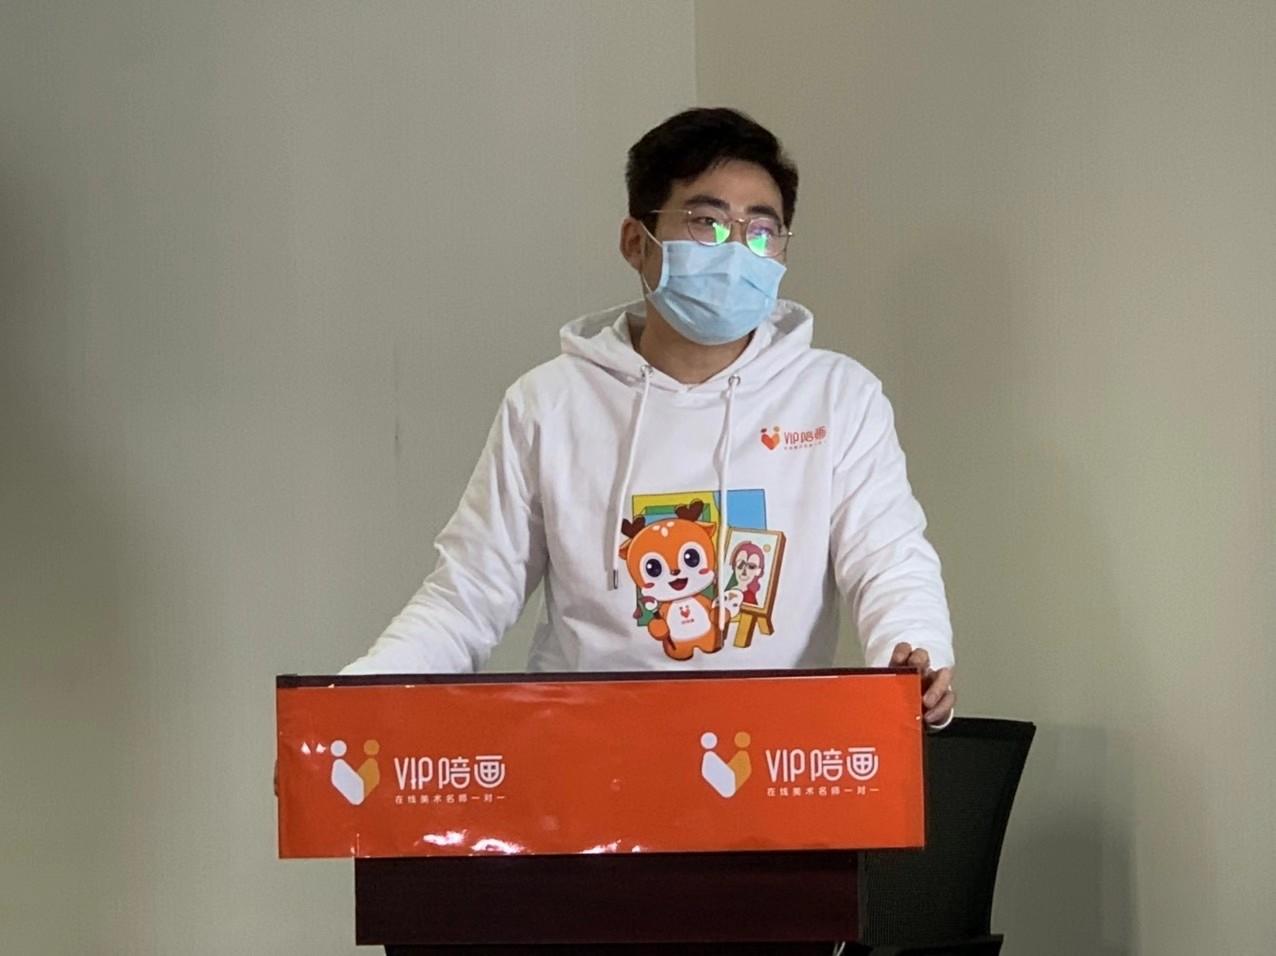 VIP陪画少儿美育研究院-北京站启动仪式,打造高端定制美育